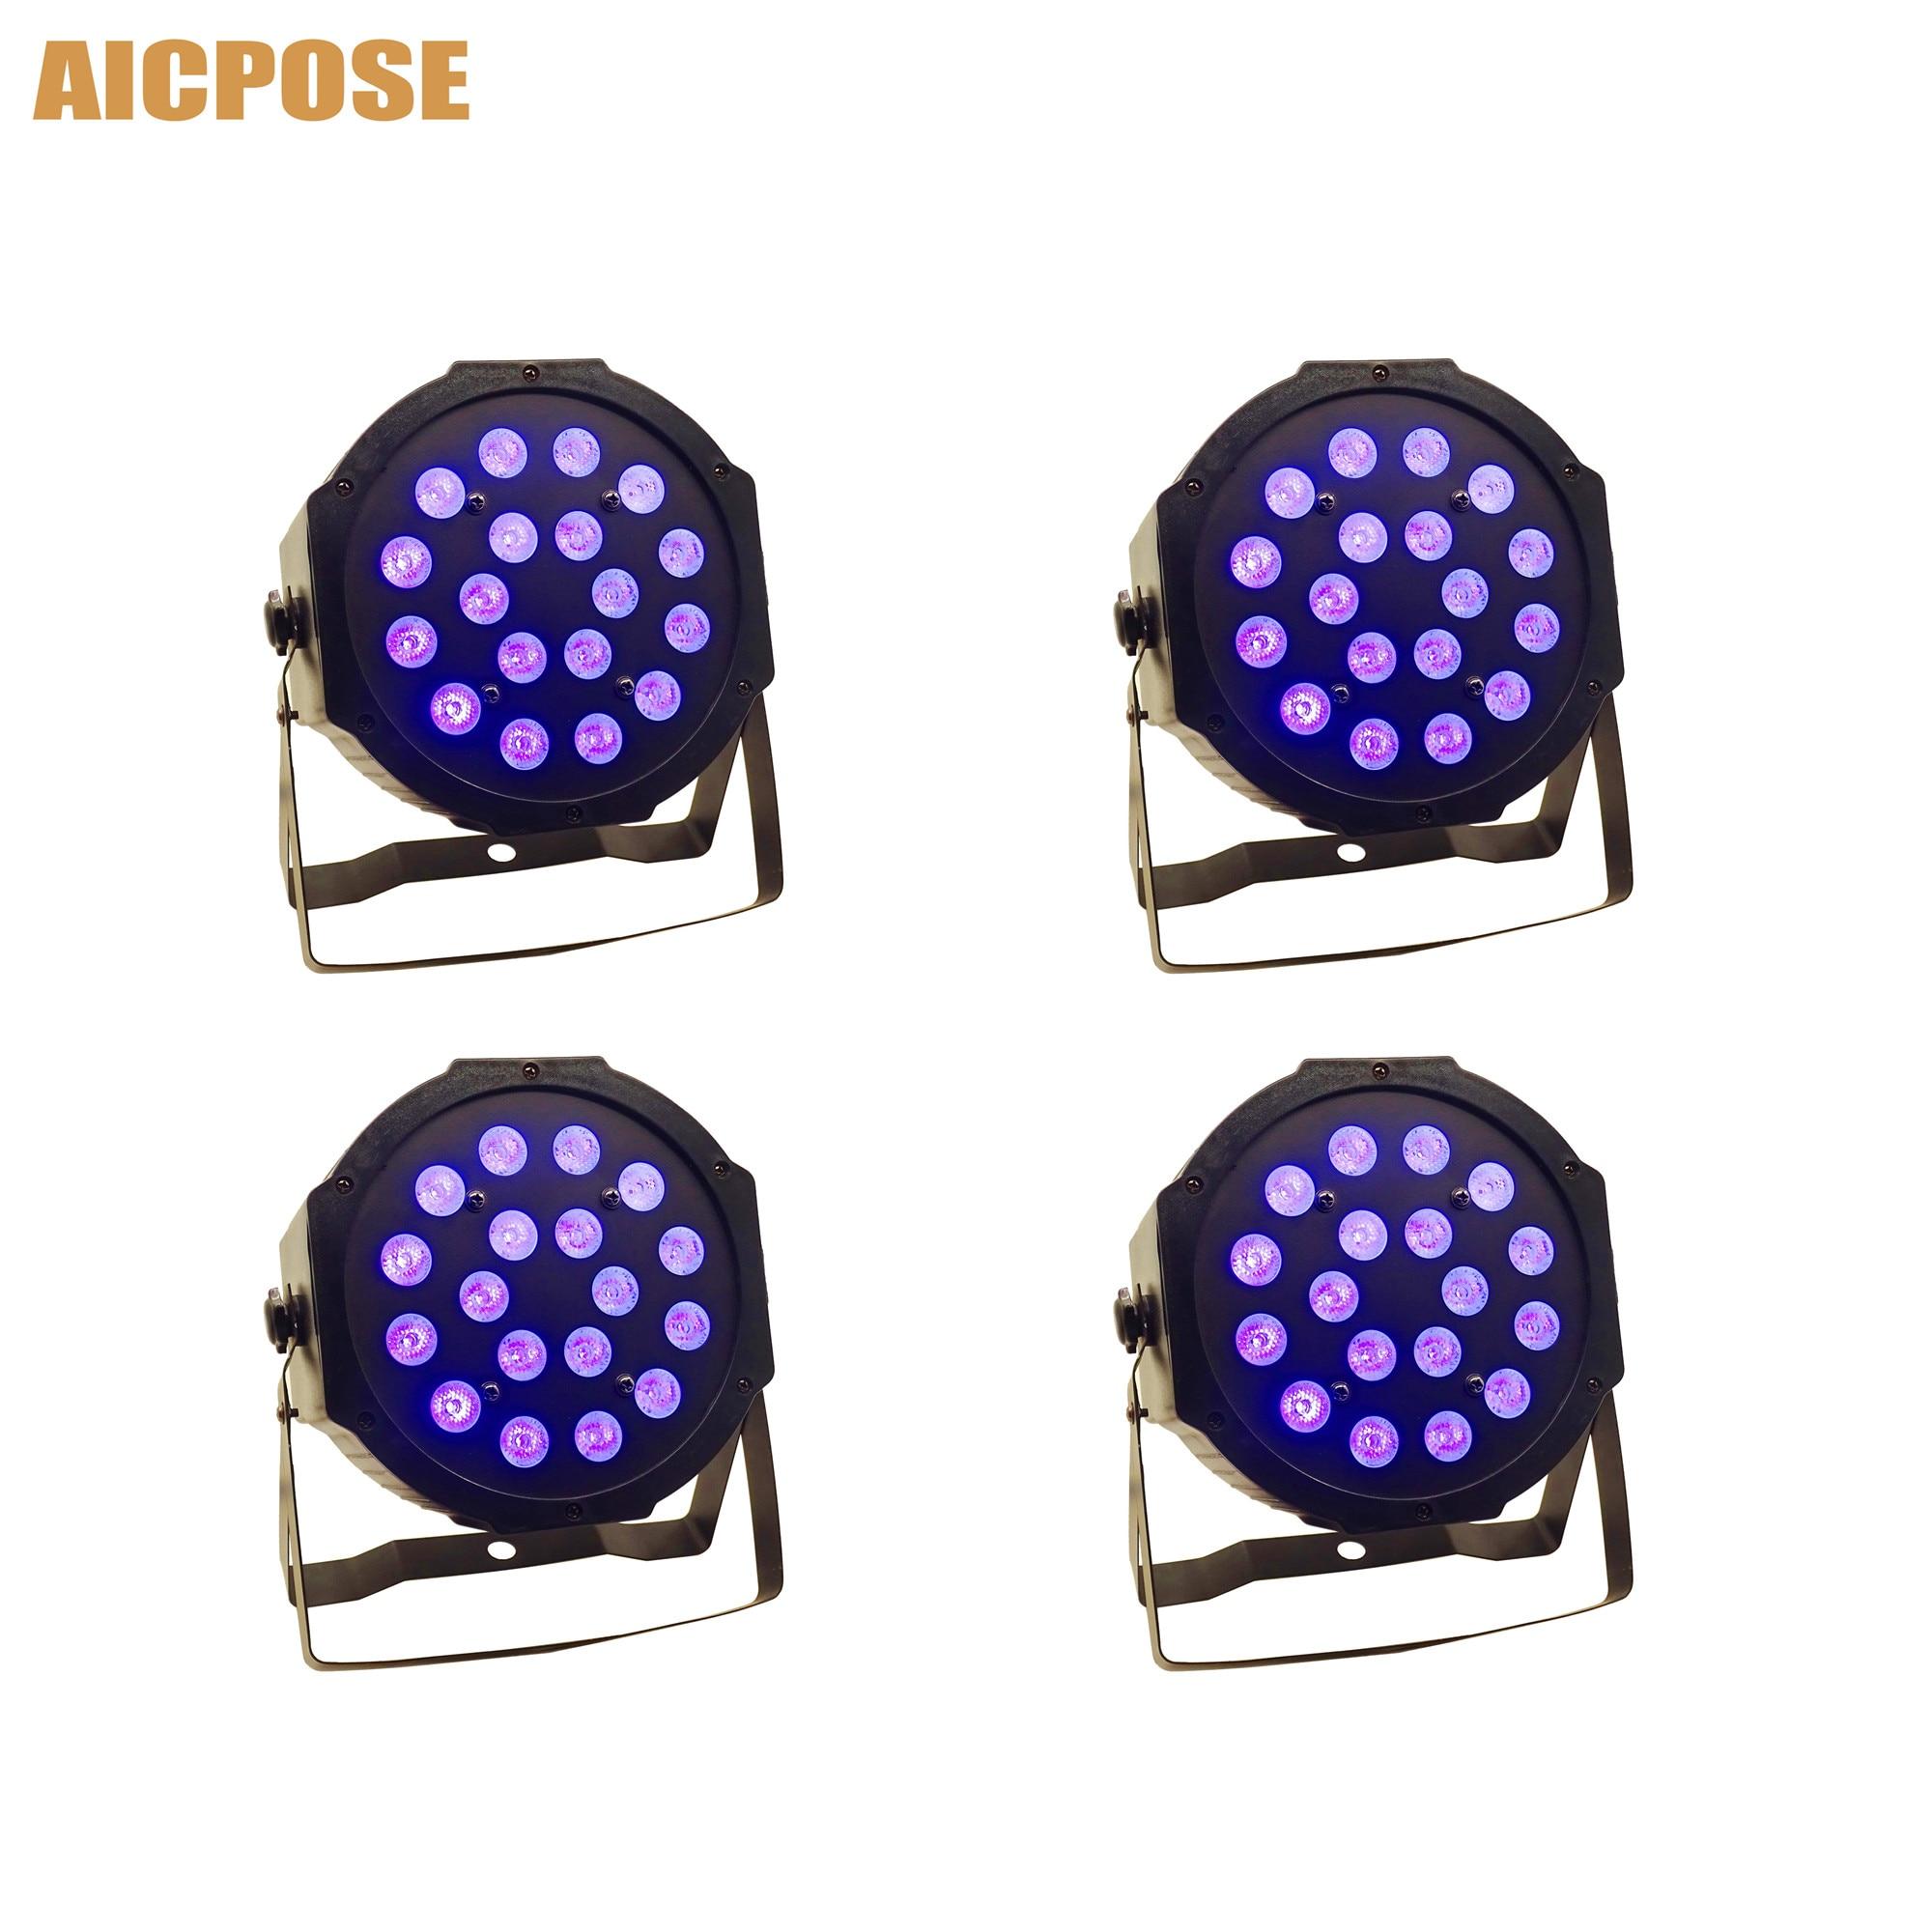 4pcs/lots 3w Led Lamp Beads 18x3w UV LED Par Stage Light Flat Par Led Dmx512 Disco Lights Professional Stage Dj Equipment